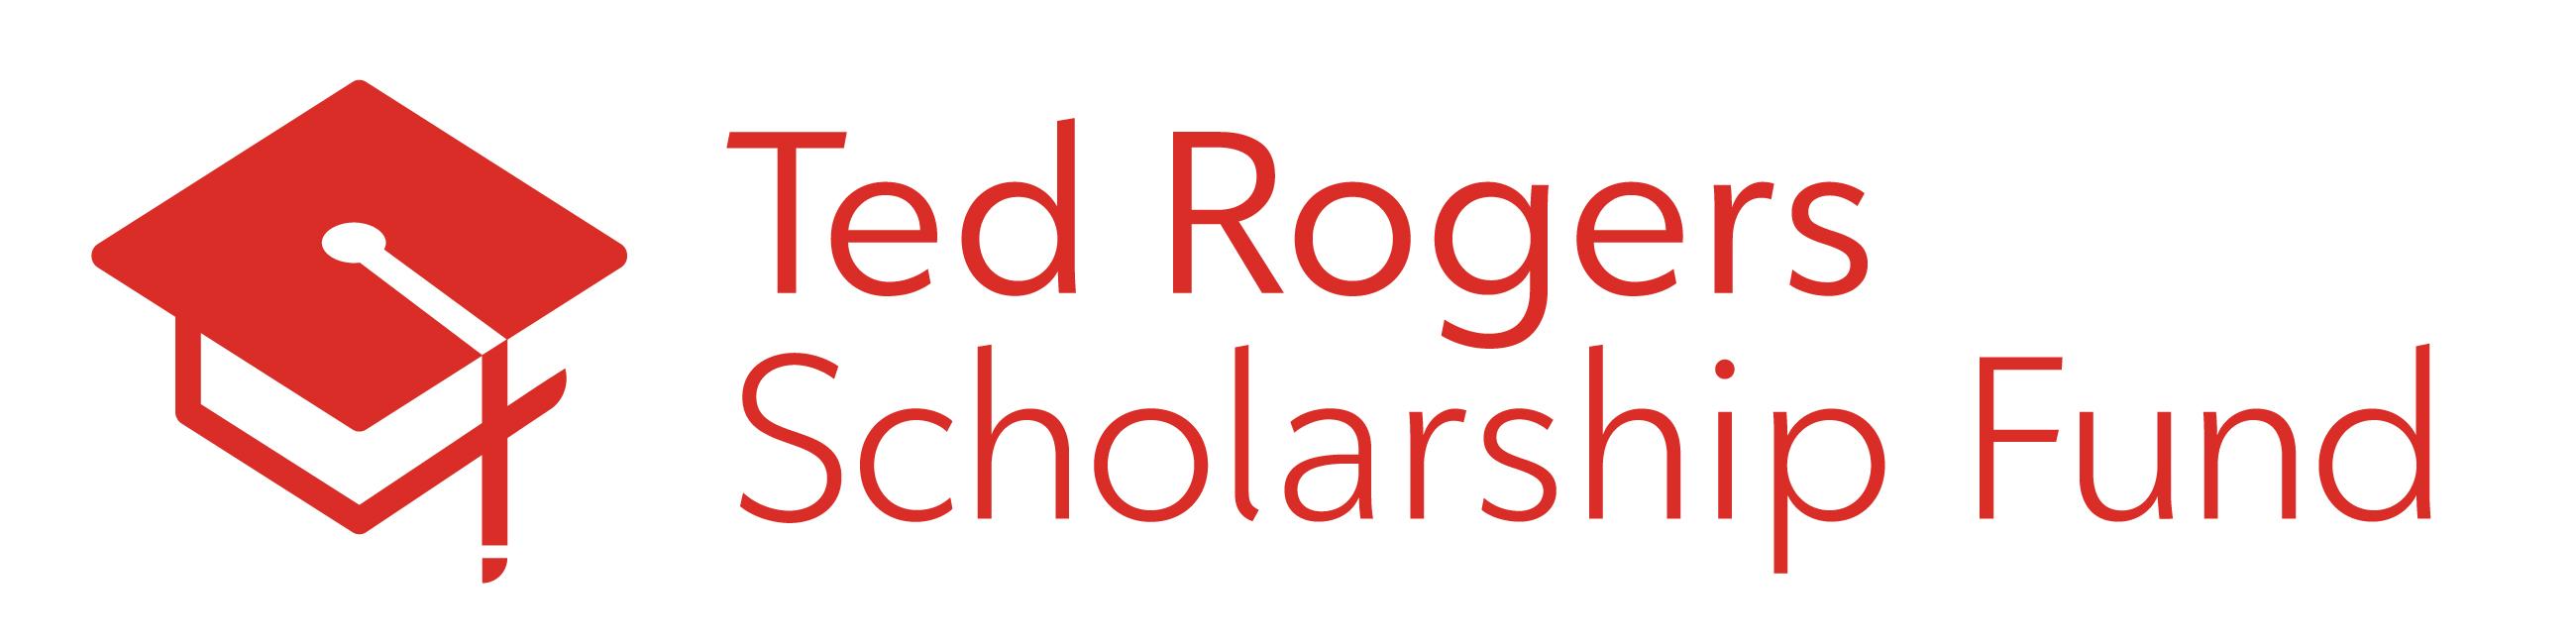 Rog_17_TedRogersScolarshipFund_RGB_MAIN_ENG